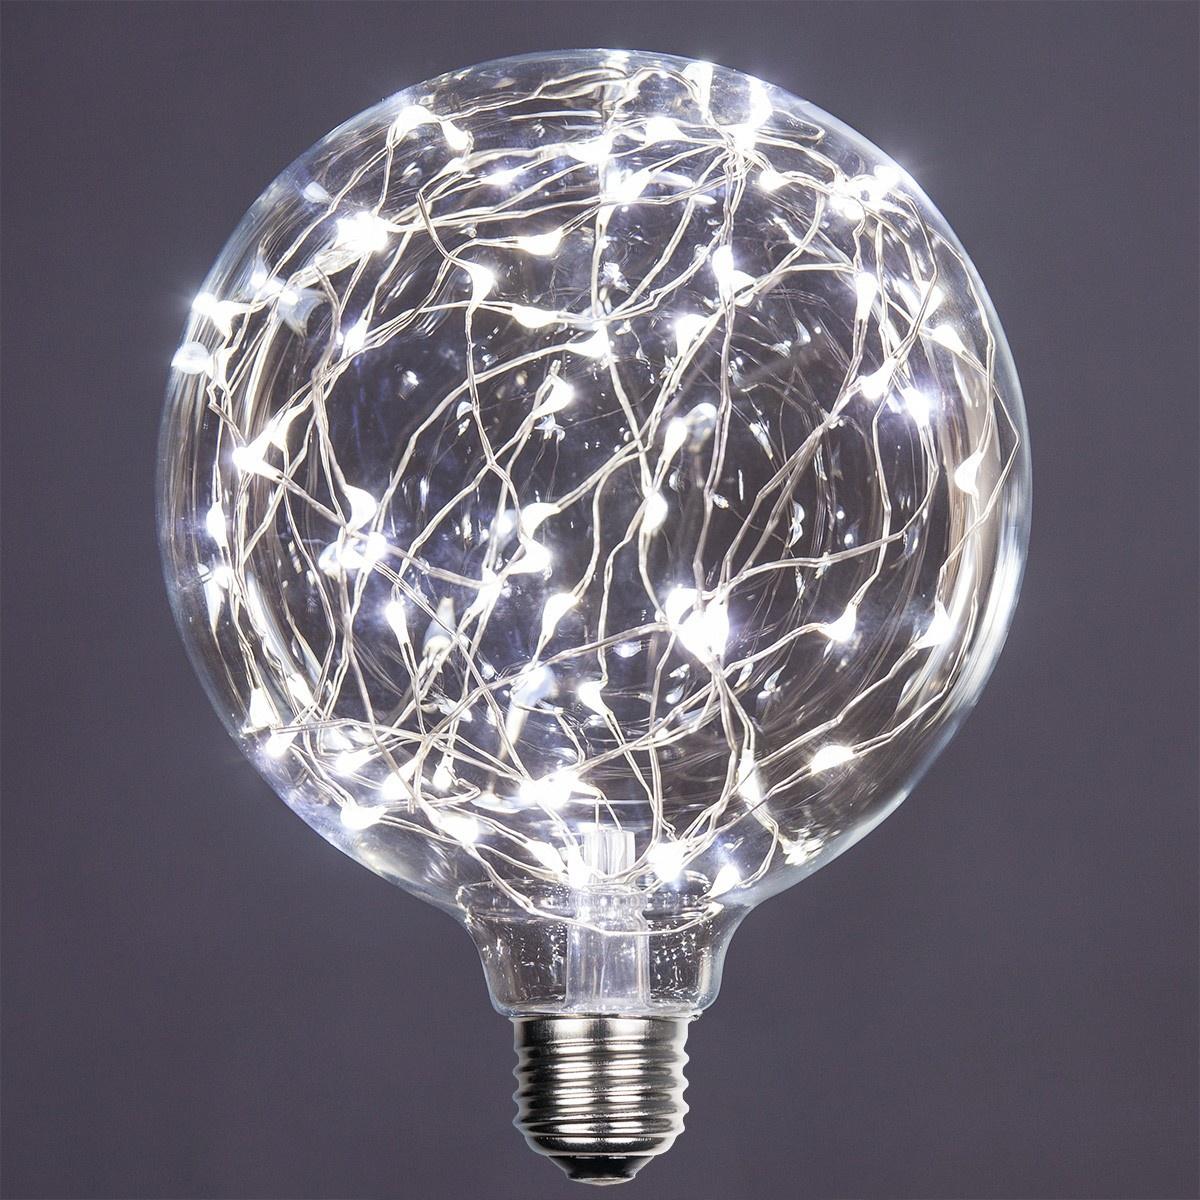 Mini Light Bulbs